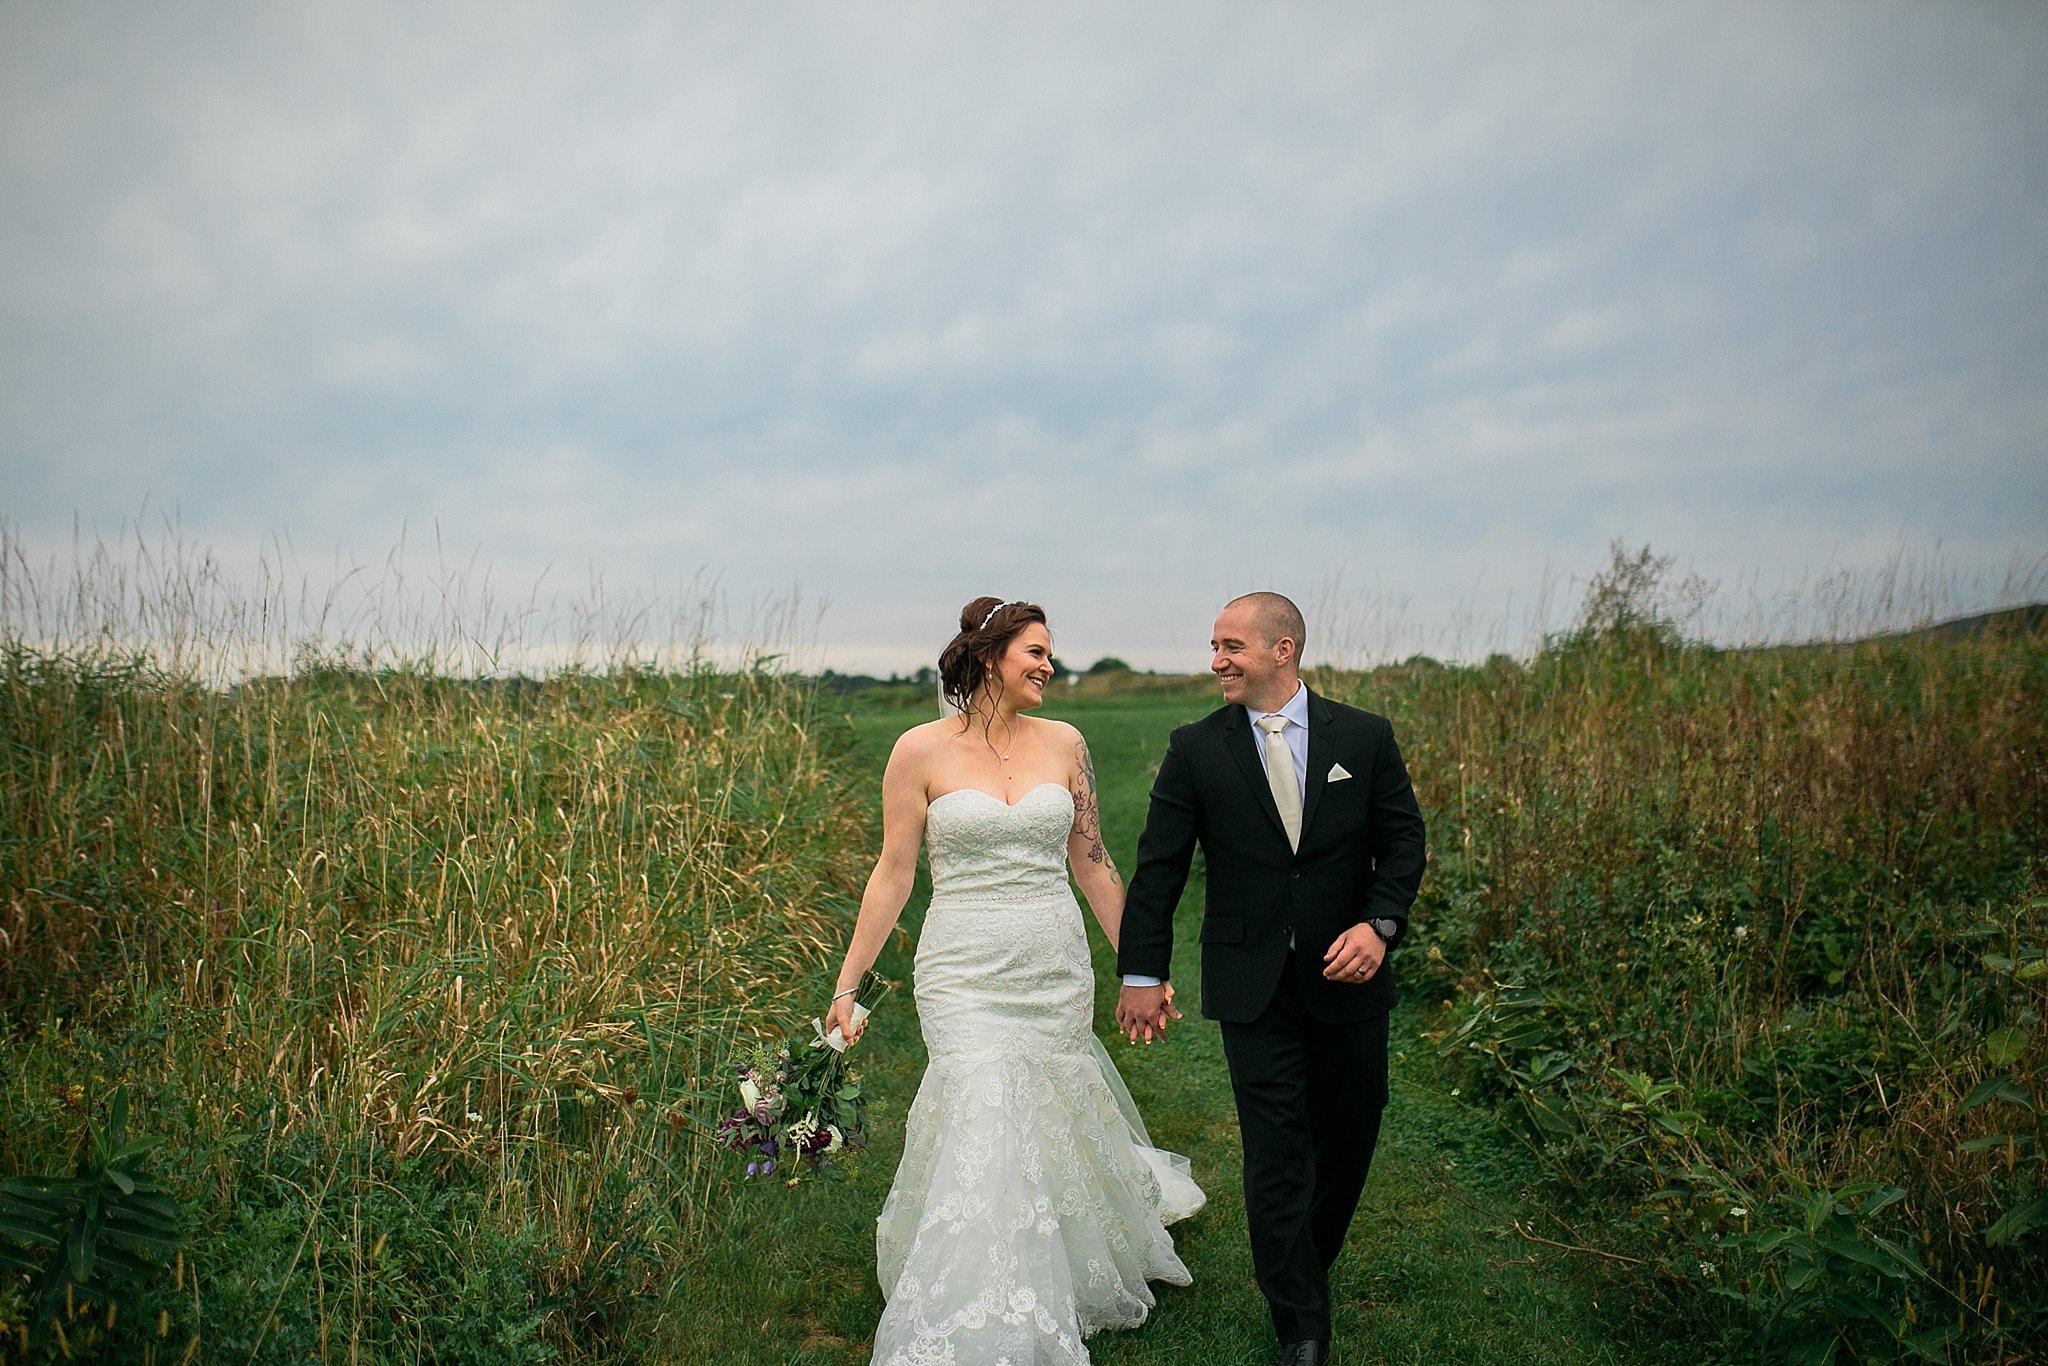 Links at Unionvale Wedding Lagrangeville Wedding Hudson Valley Wedding Photographer Sweet Alice Photography60.jpg